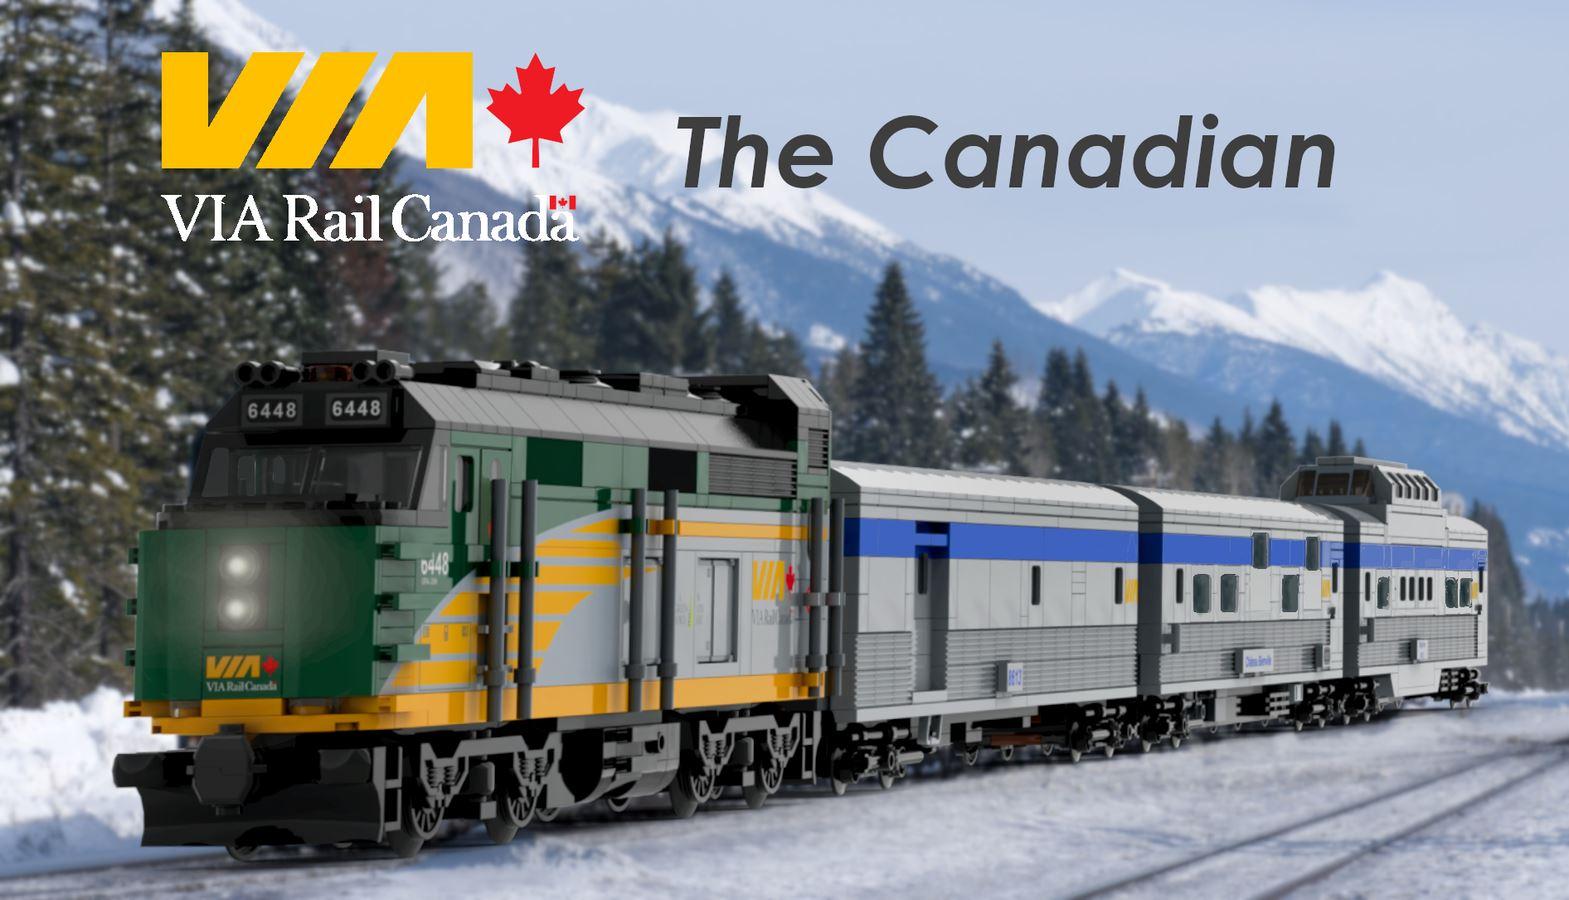 LEGO Ideas Via Rail Canada - The Canadian